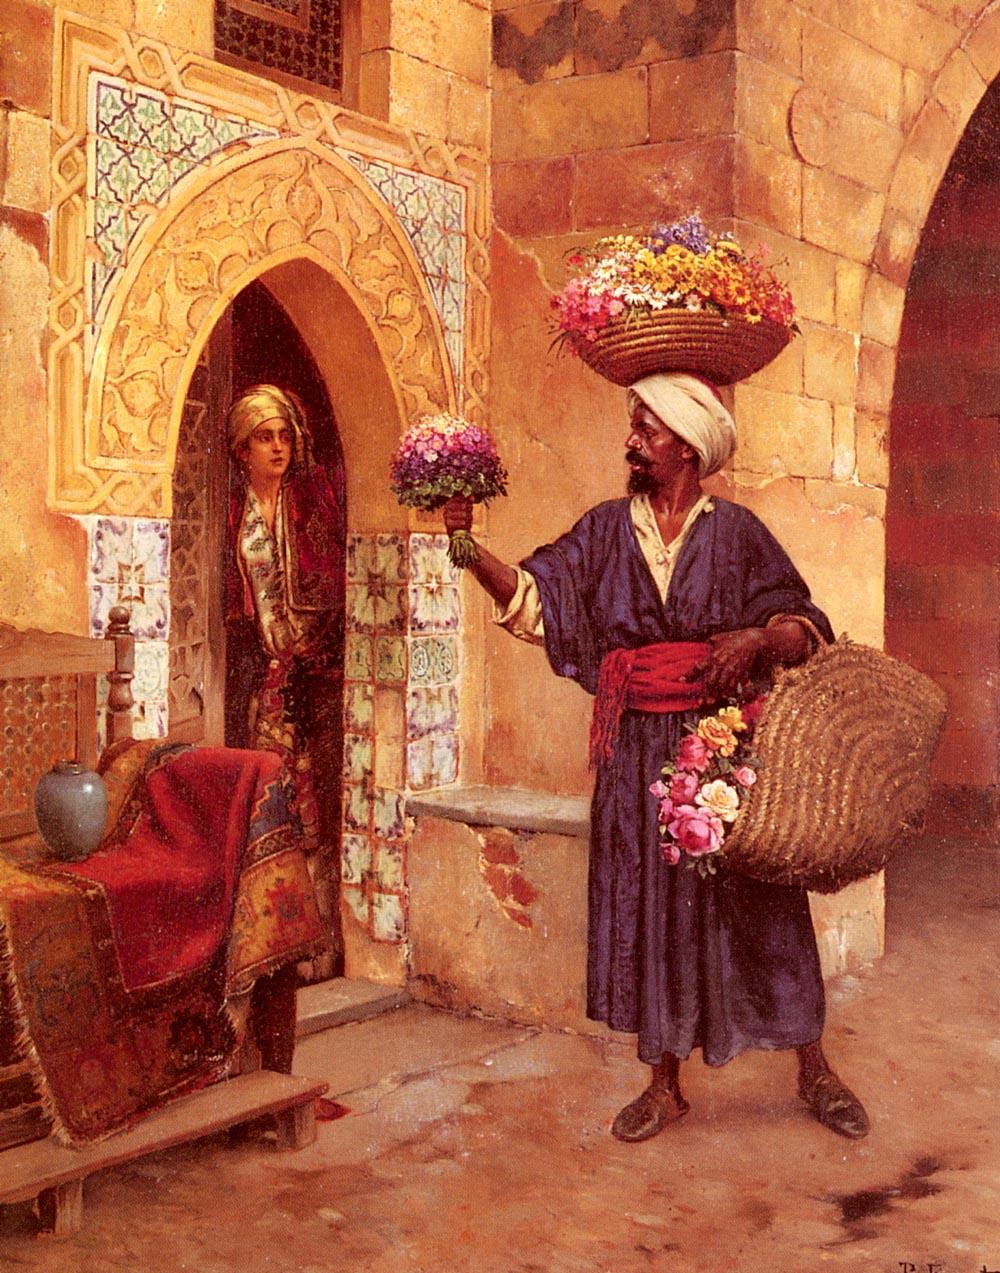 The Flower Merchant :: Rudolf Ernst - scenes of Oriental life (Orientalism) in art and painting ôîòî